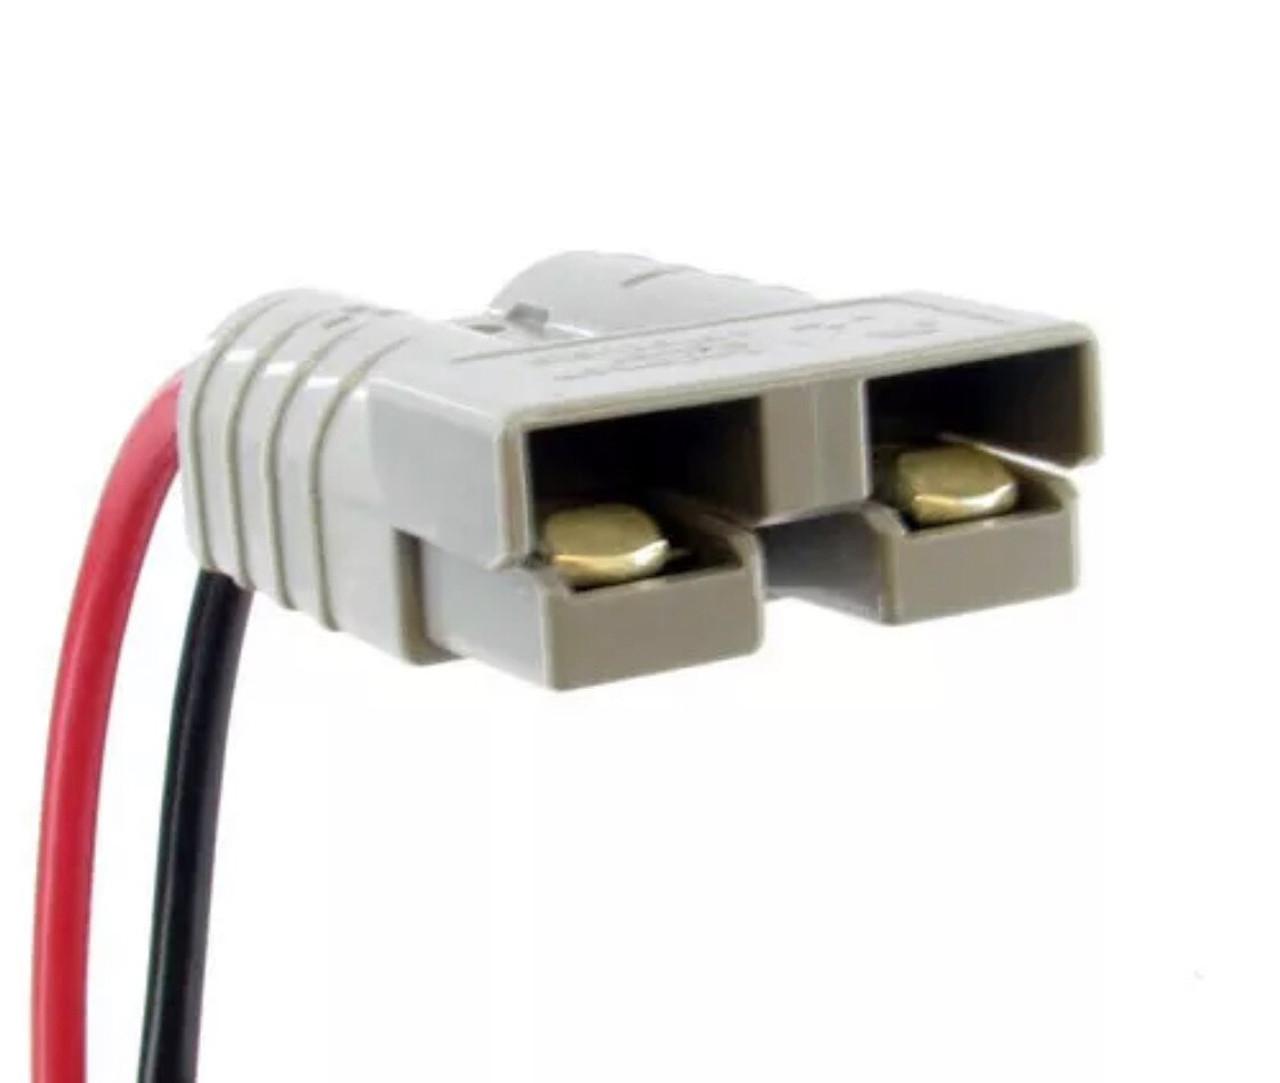 Raion Power RBC7P Wiring Harness Connector For APC BackUPS Pro BP1400X116 UPS Unit